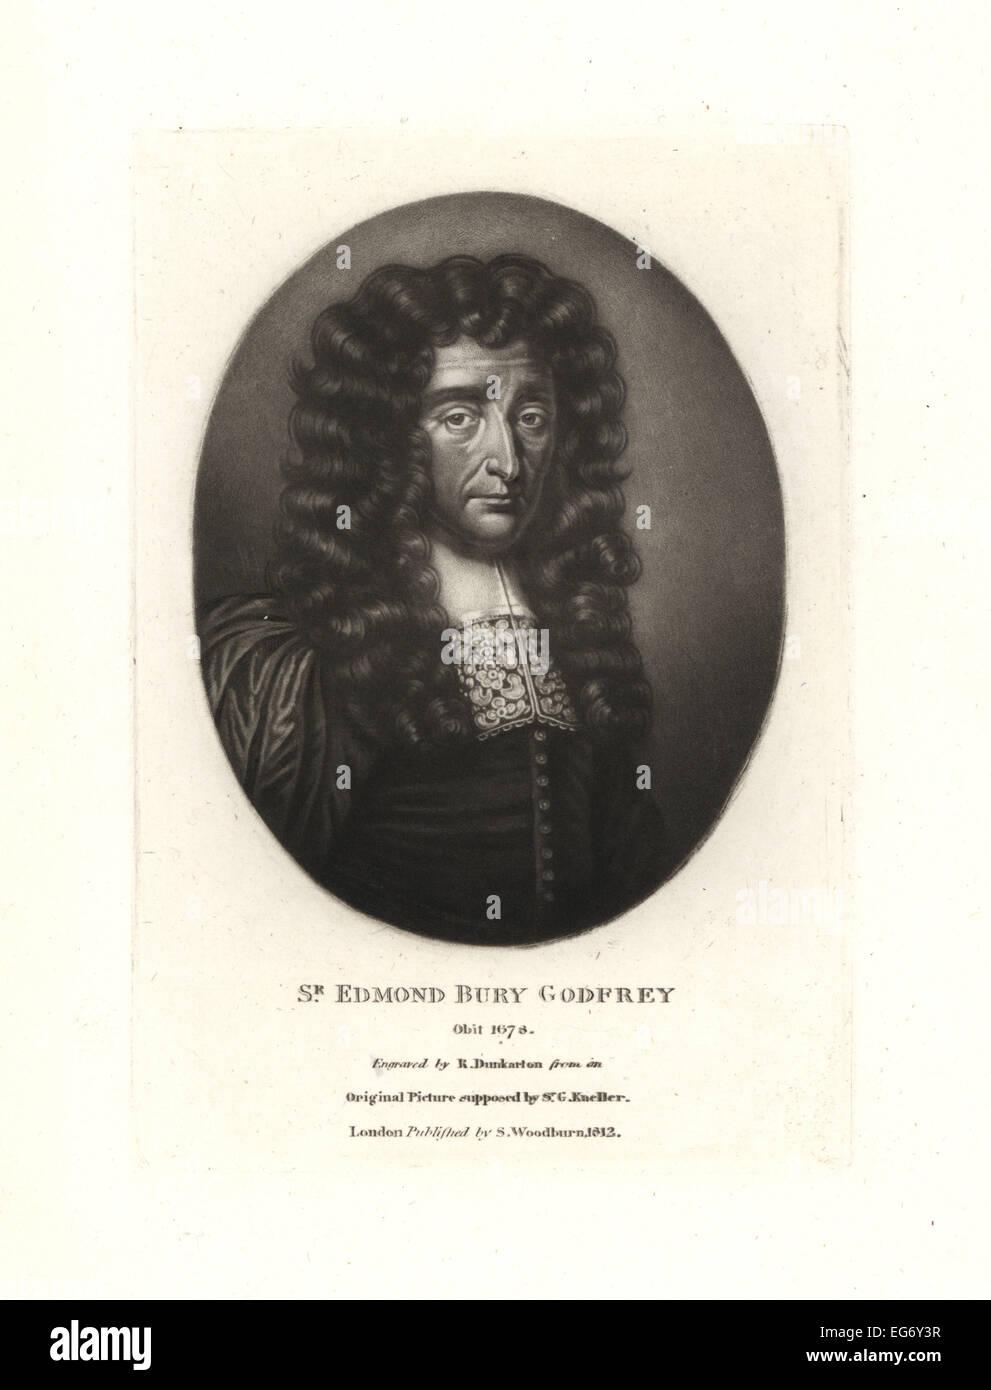 Sir Edmond Bury Godfrey, English magistrate, murdered 1678. - Stock Image